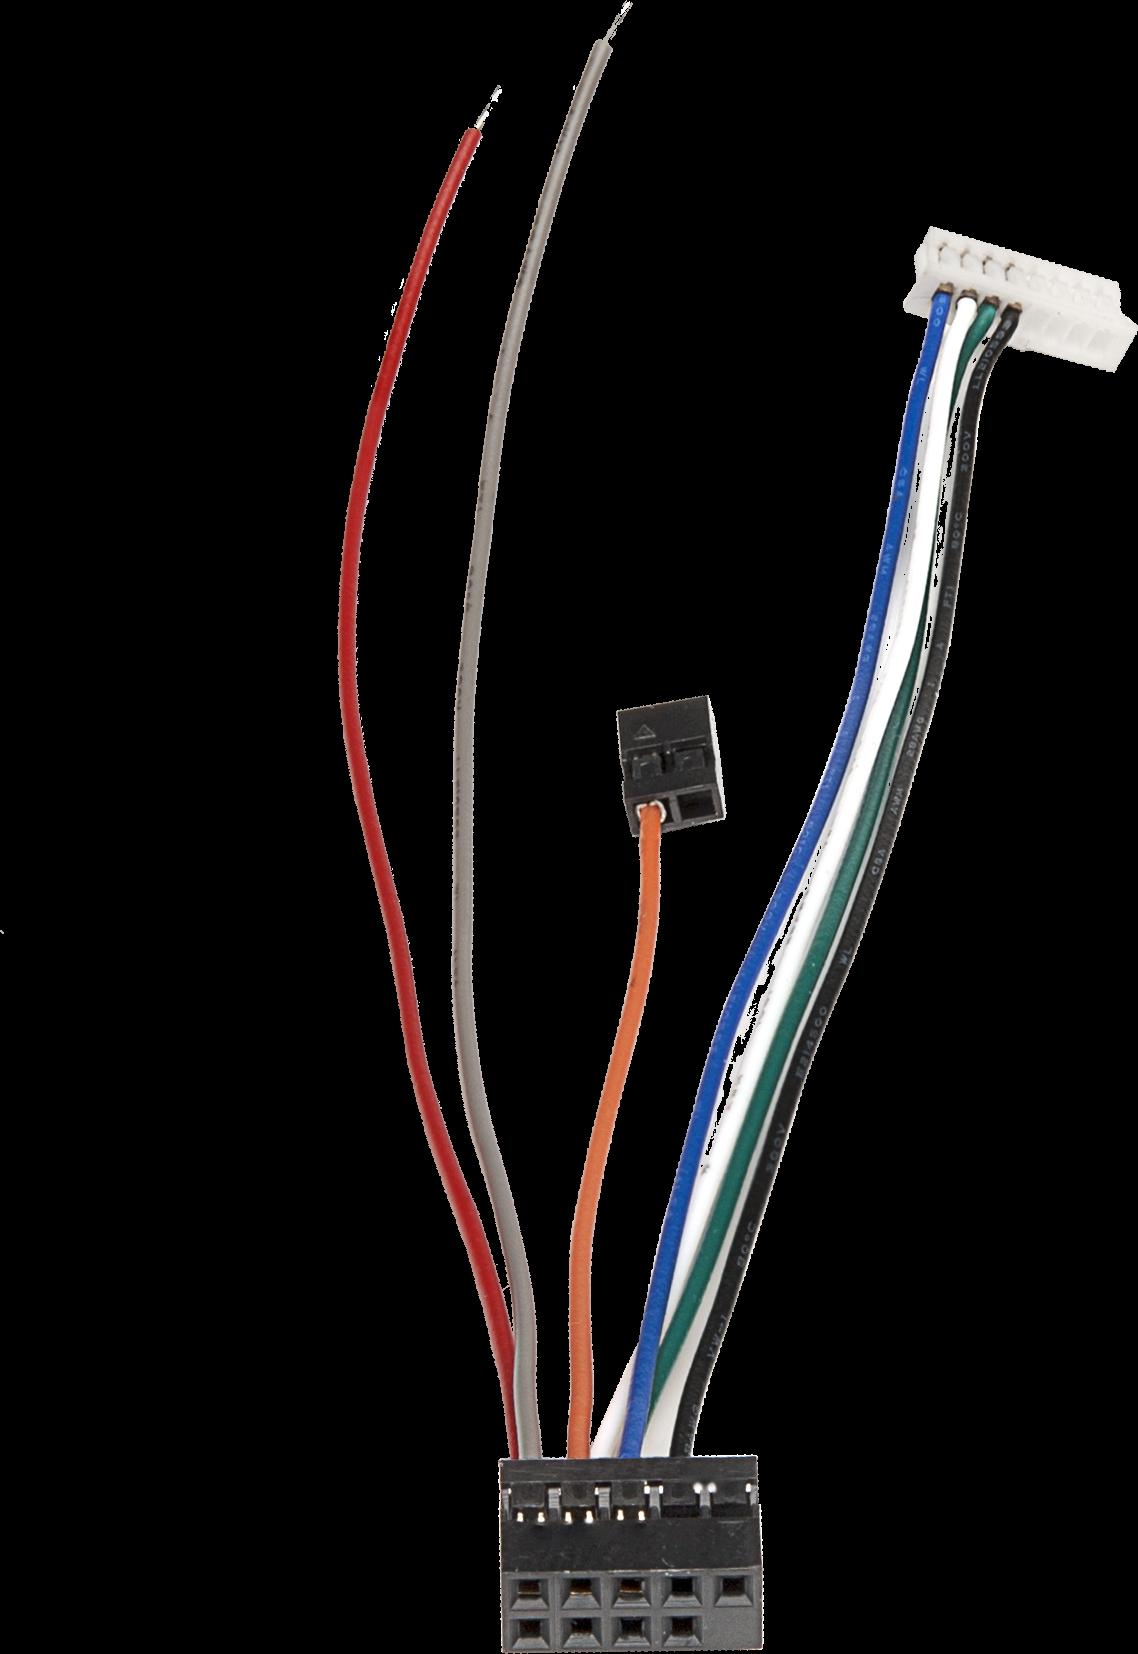 Intel NUC HDMI-CEC Adapter - Pulse-Eight - Ultra HD